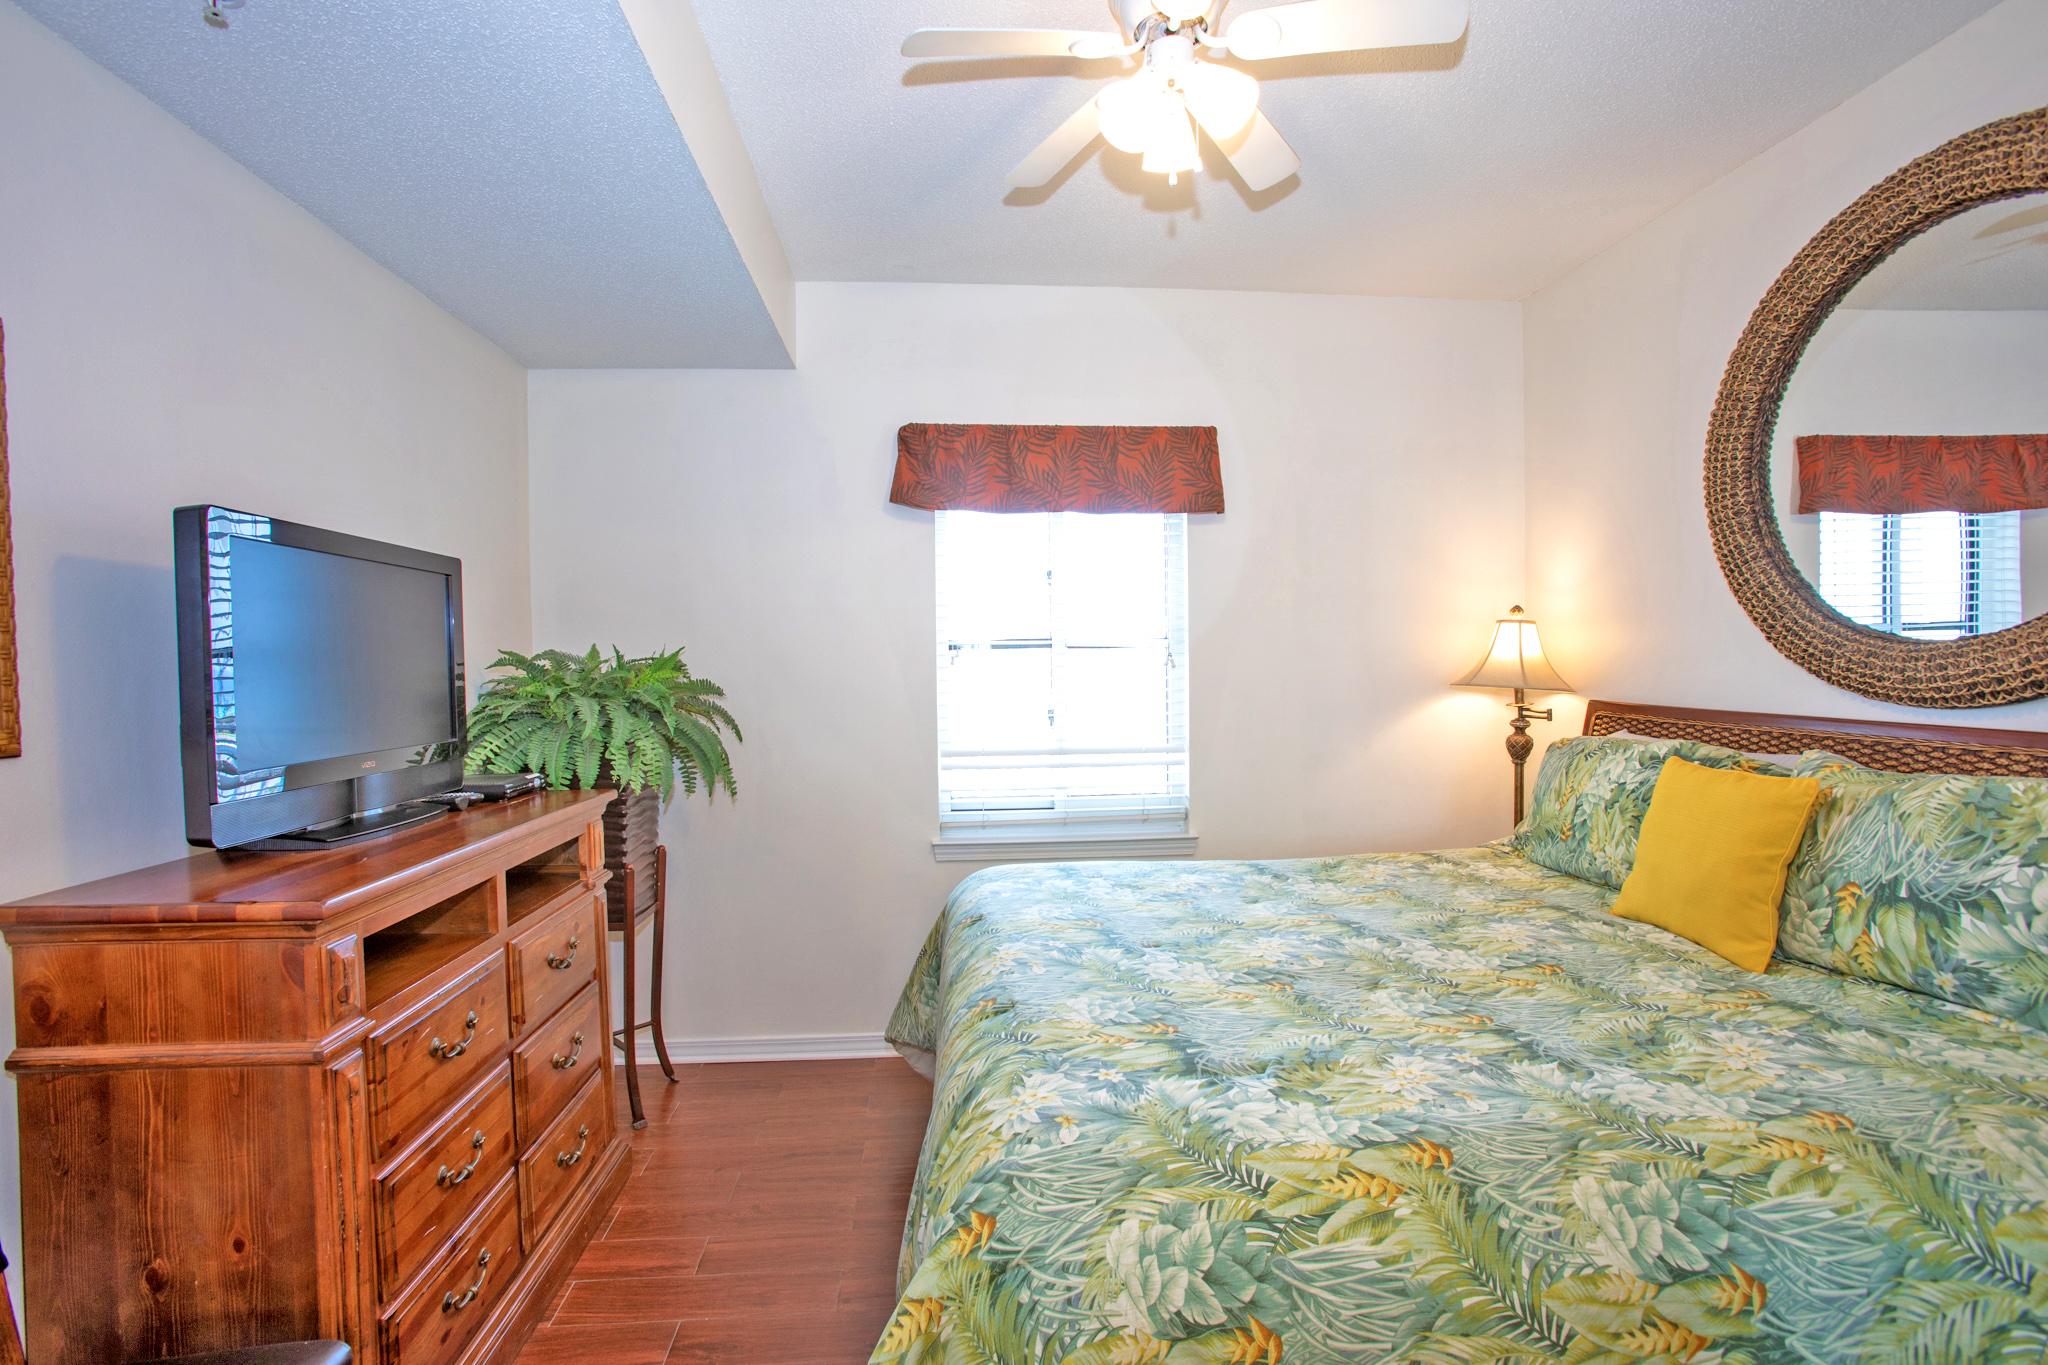 South Harbour #7E Condo rental in South Harbour ~ Pensacola Beach Vacation Rentals by BeachGuide in Pensacola Beach Florida - #8